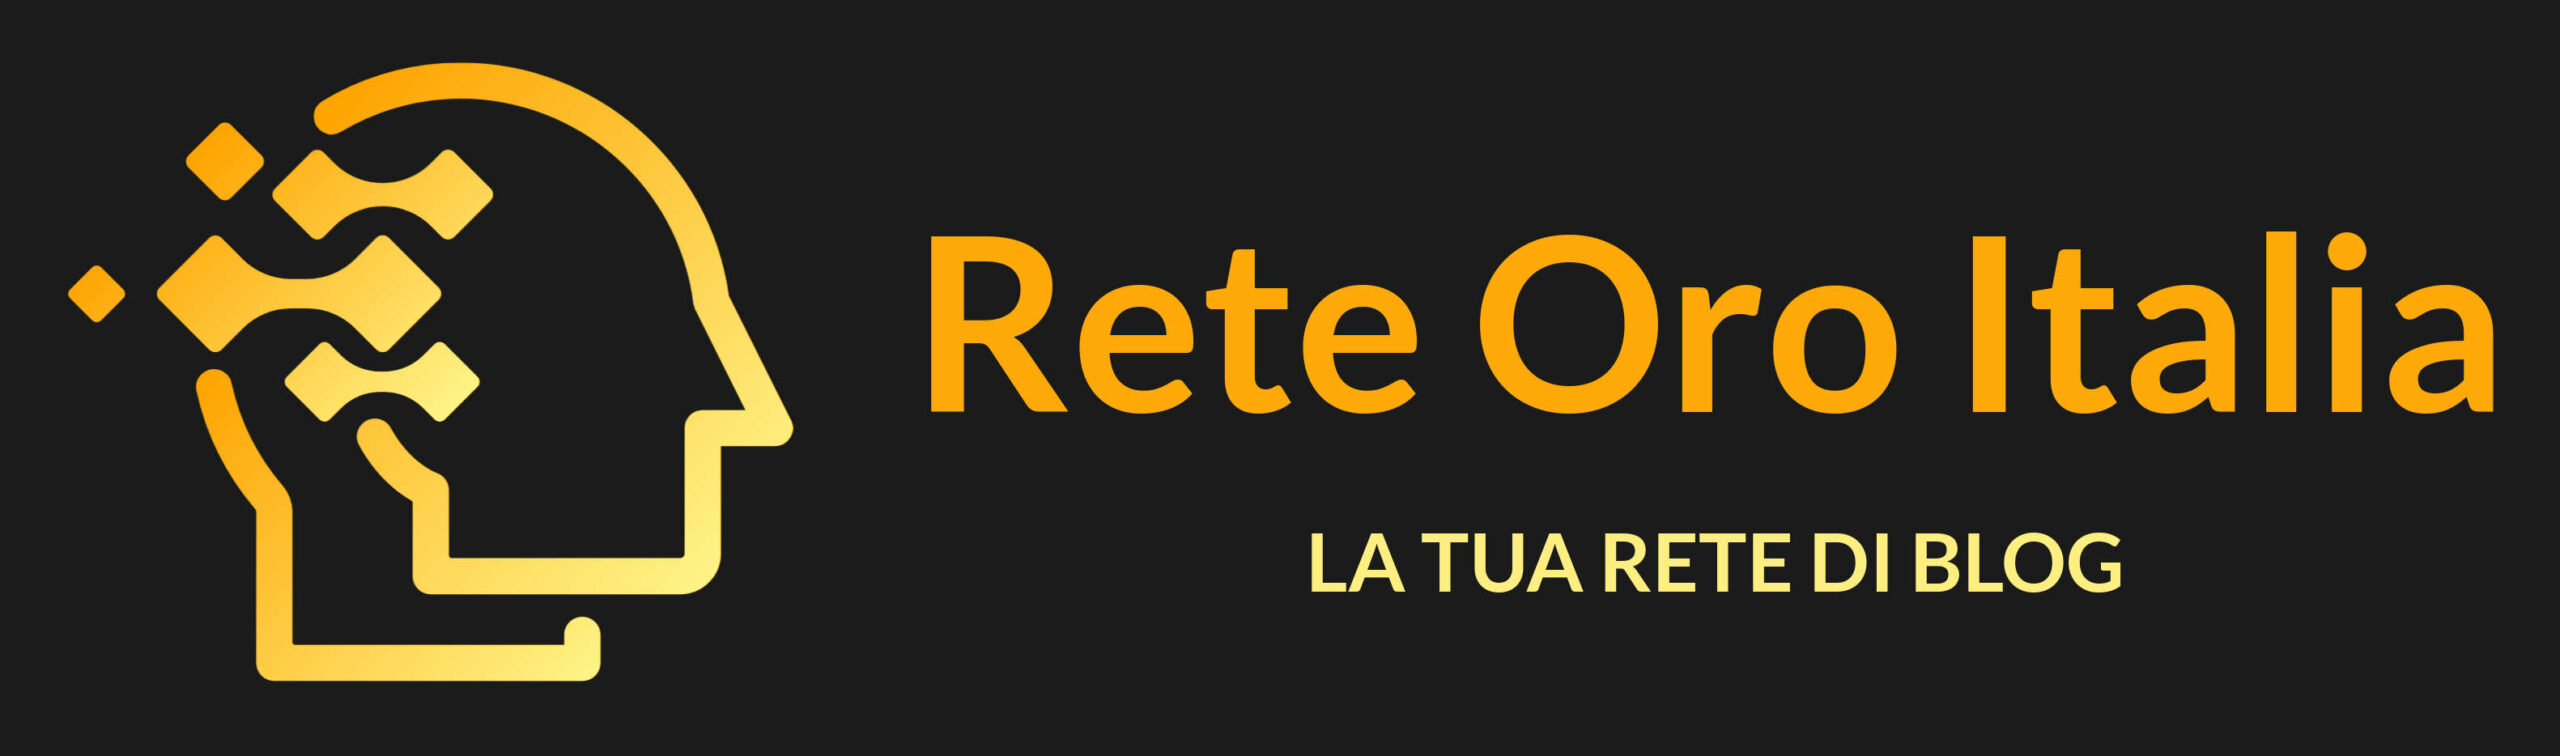 rete oro italia